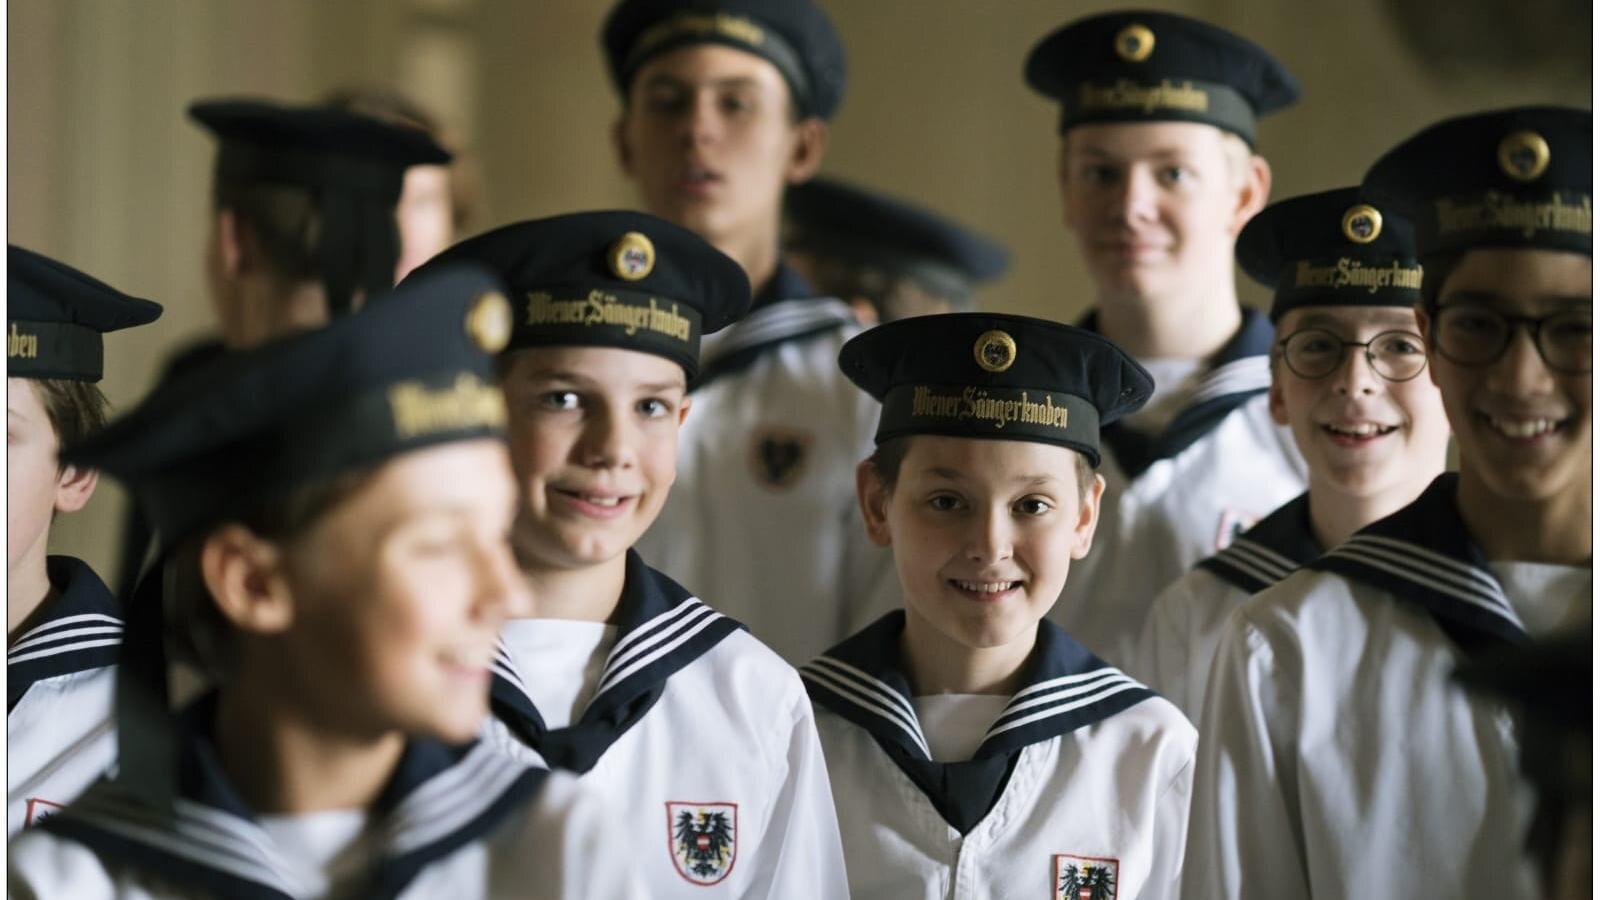 Membres del Cor de Nens de Viena